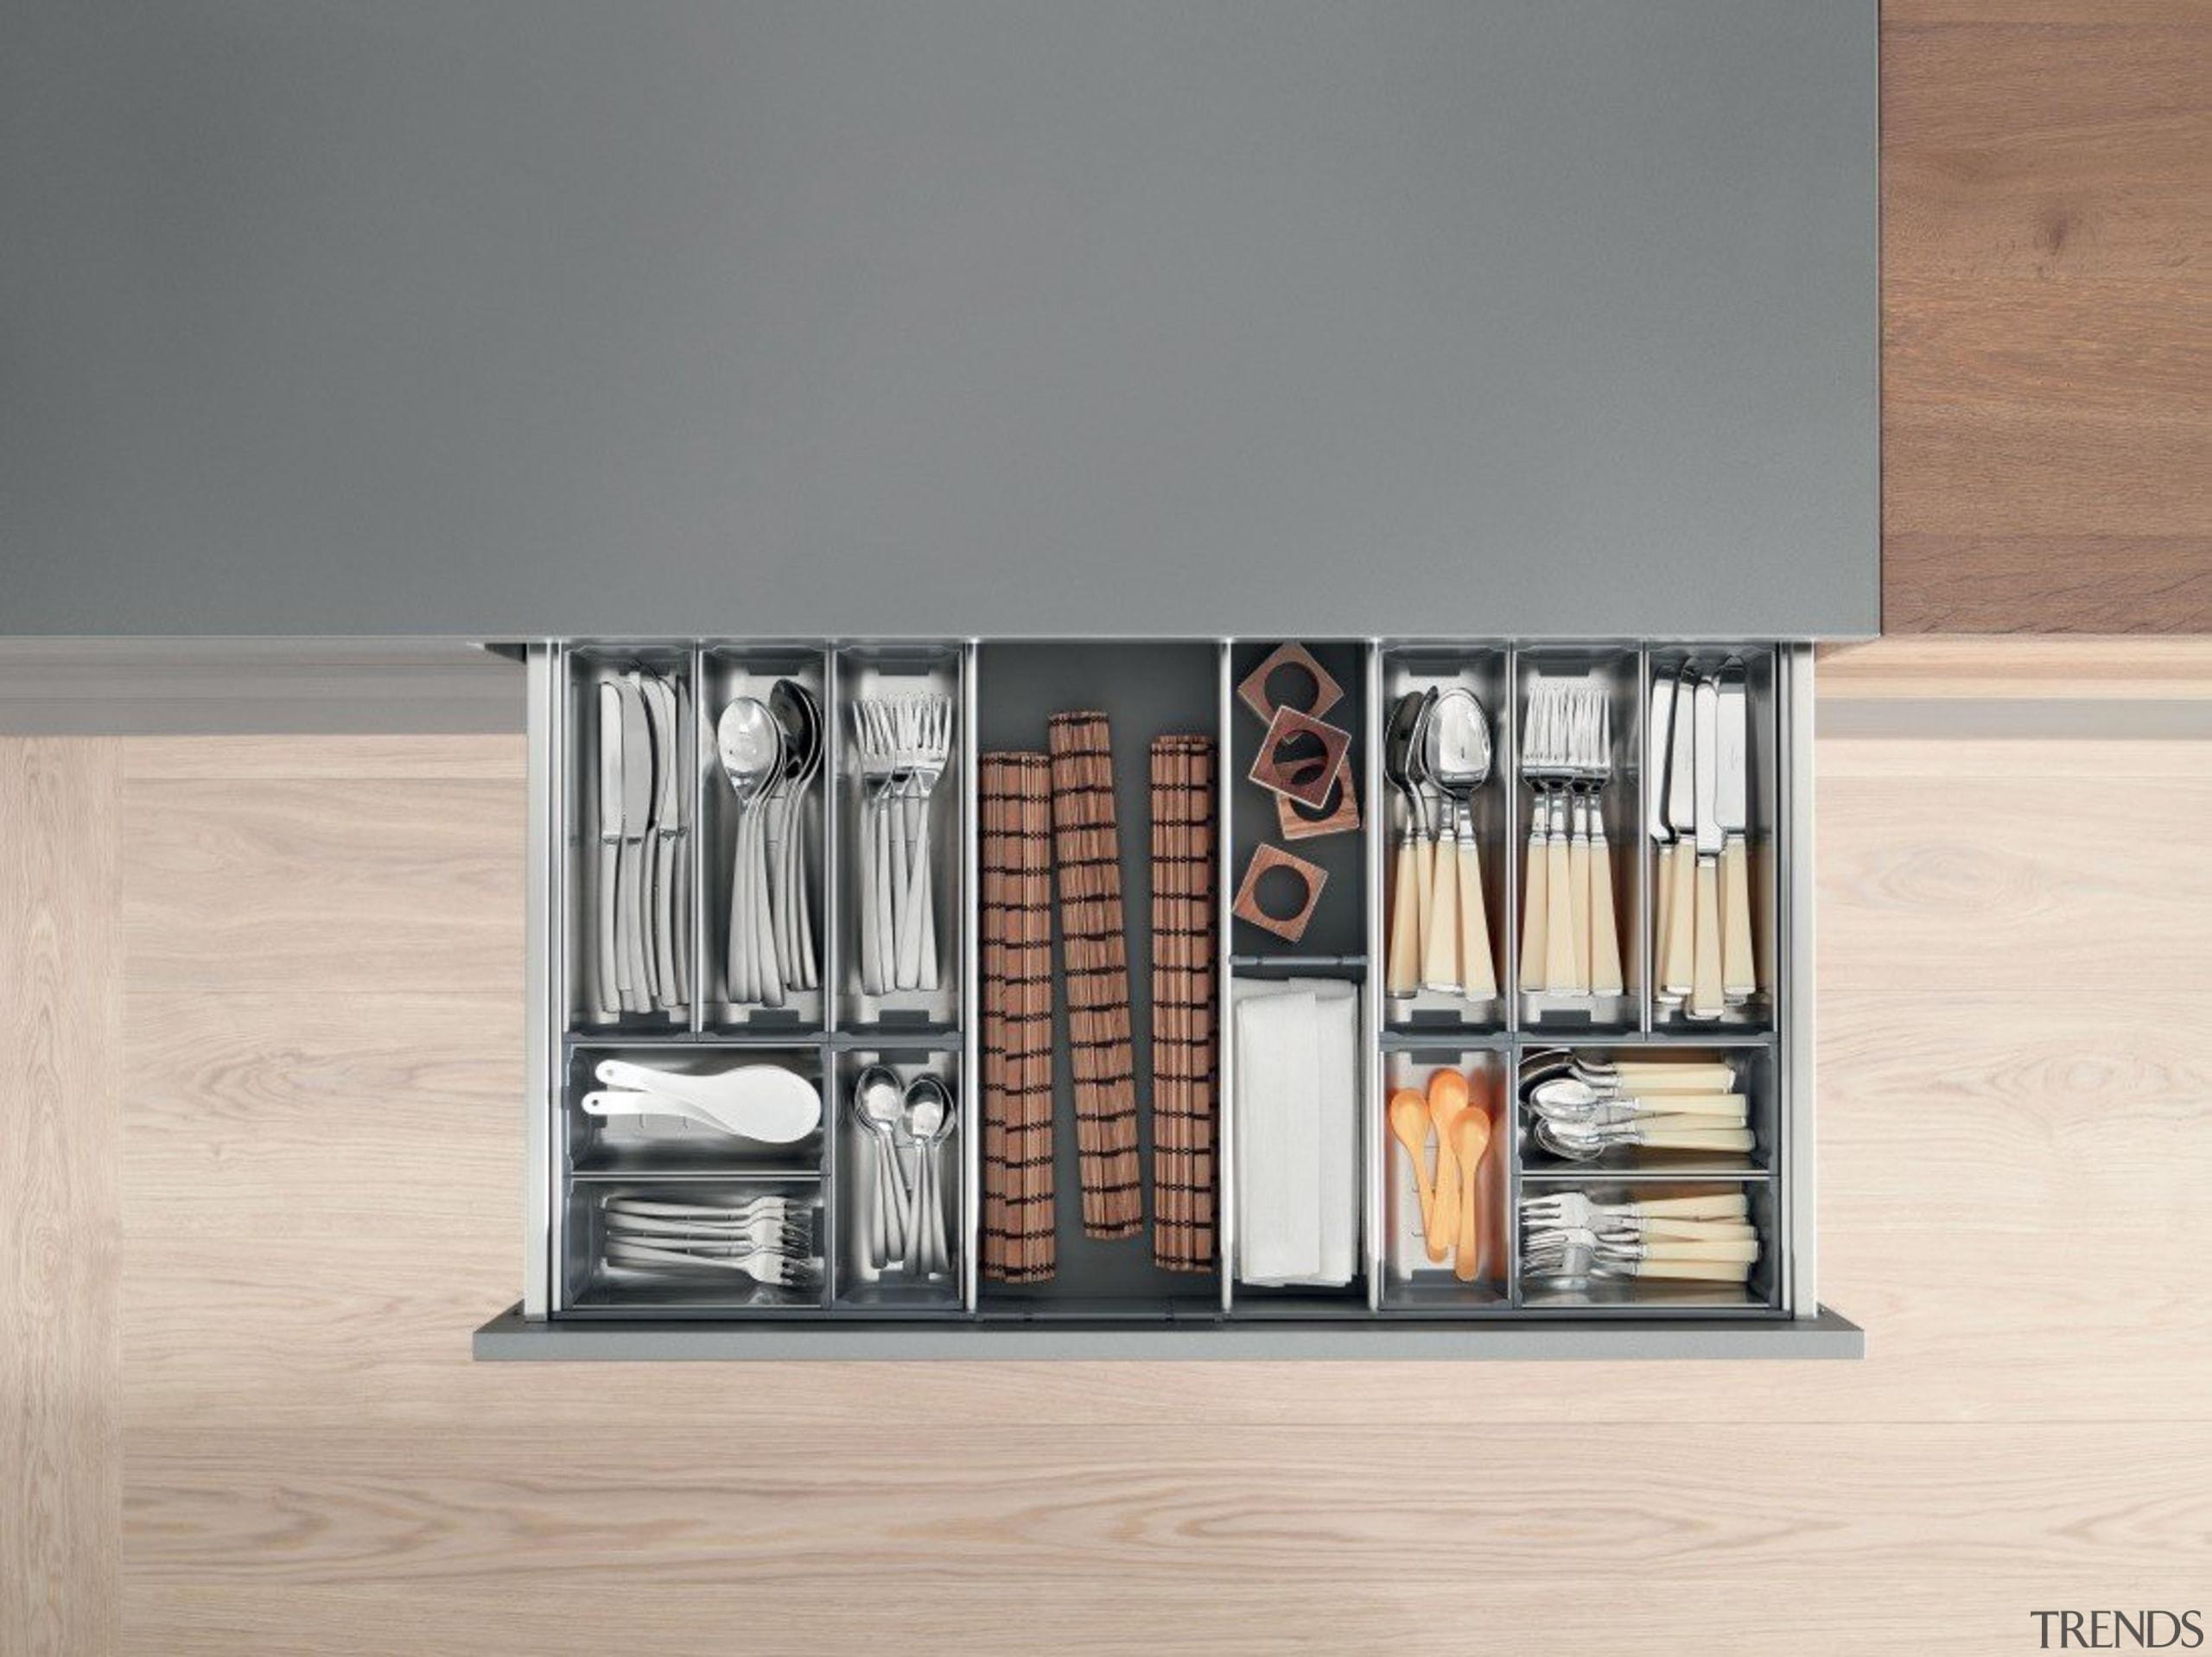 ORGA-LINE inner dividing system – so many practical furniture, product, product design, shelf, shelving, gray